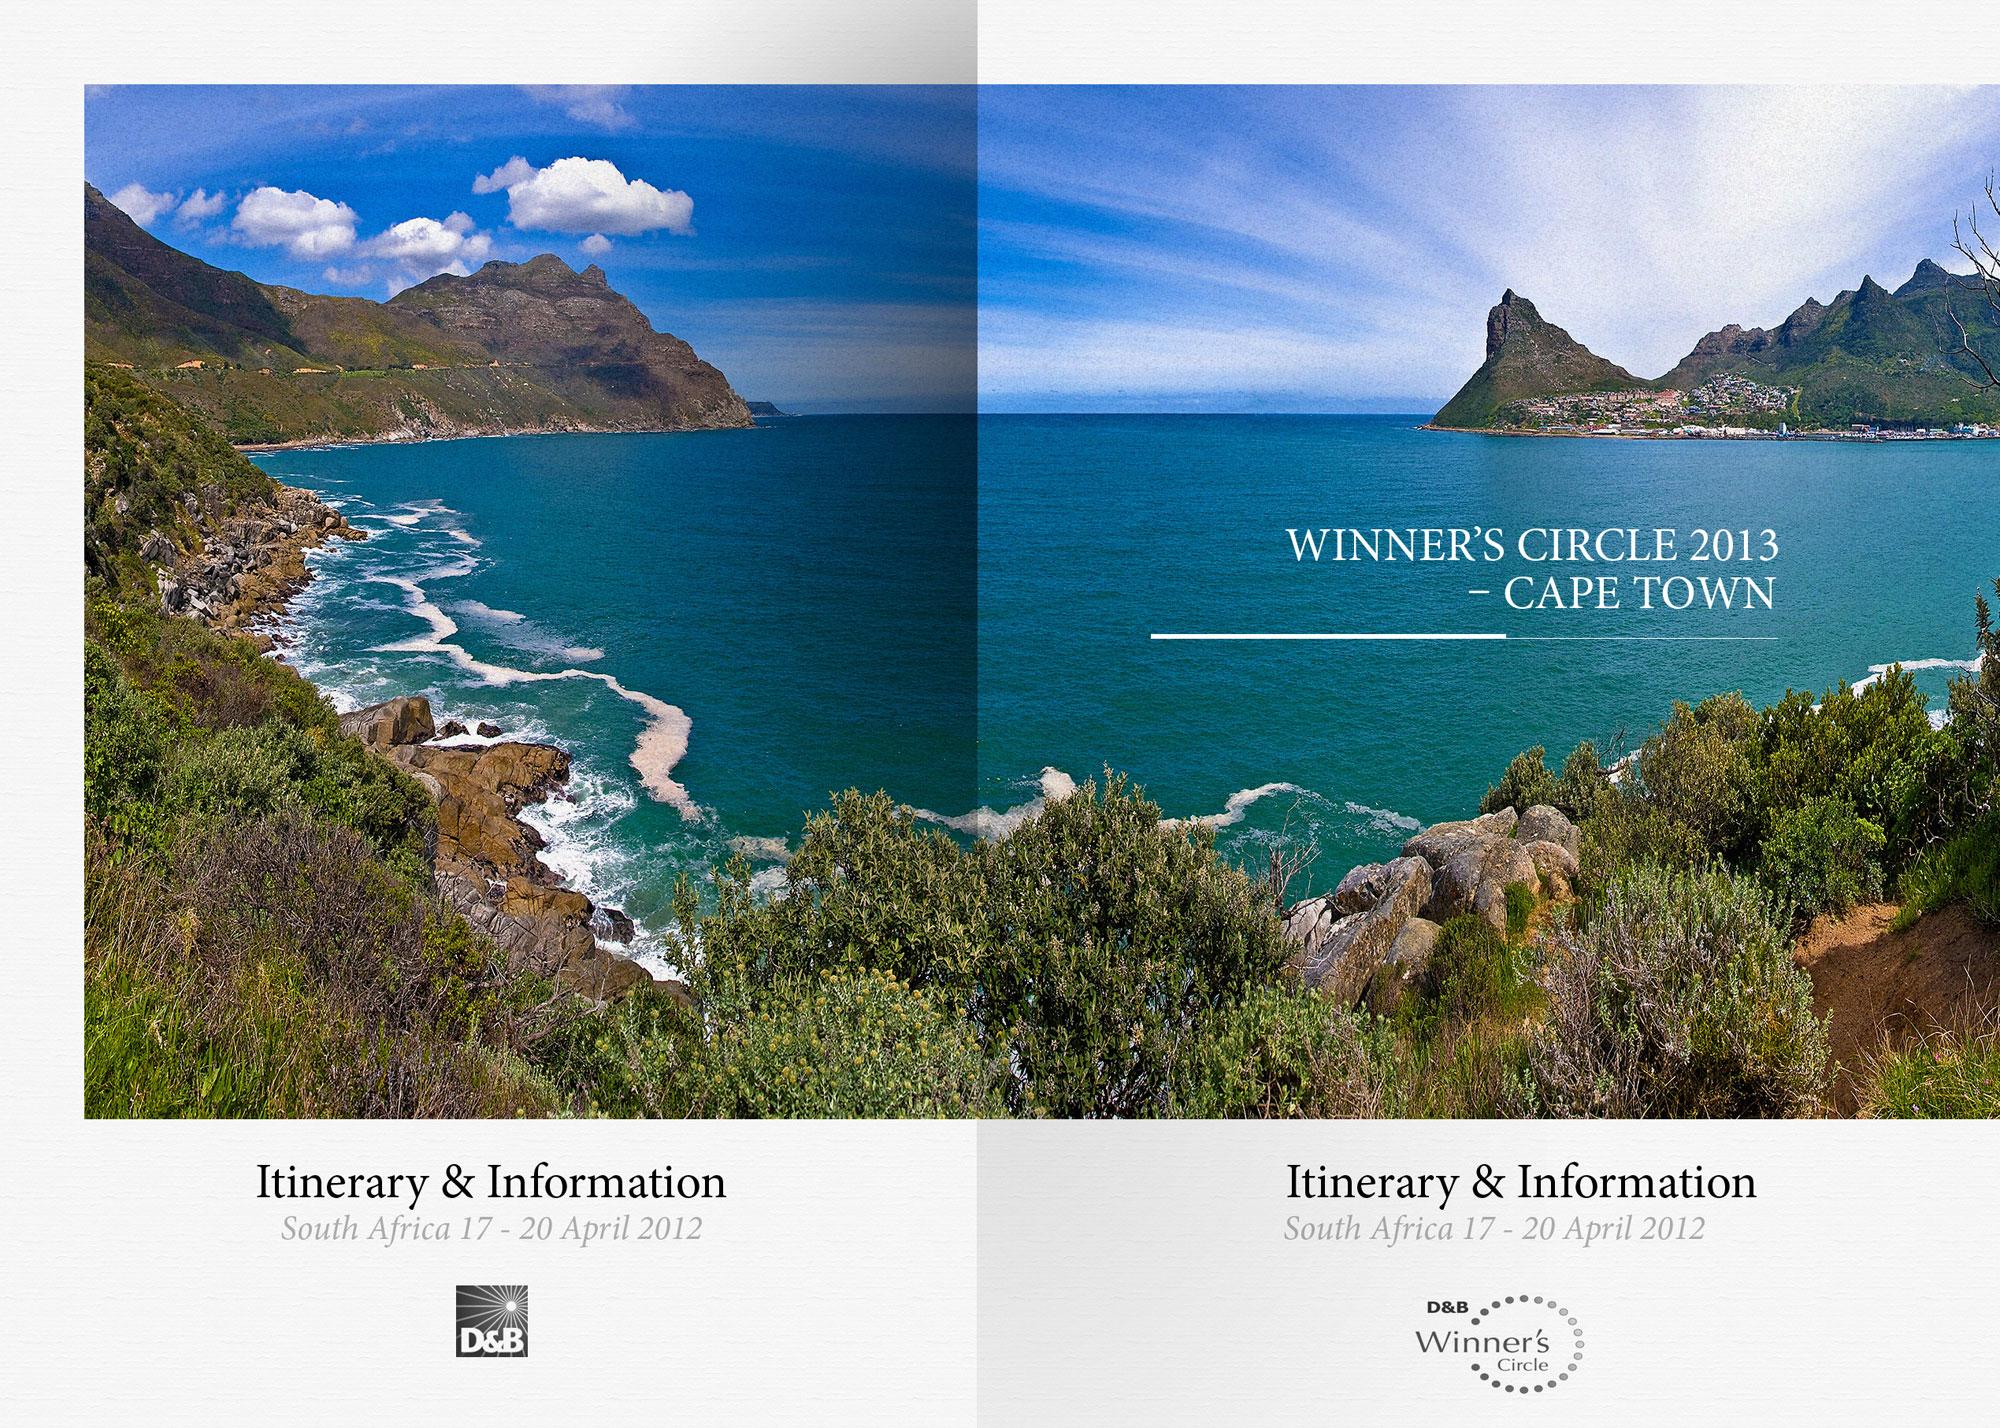 Winner's Circle – Cape Town